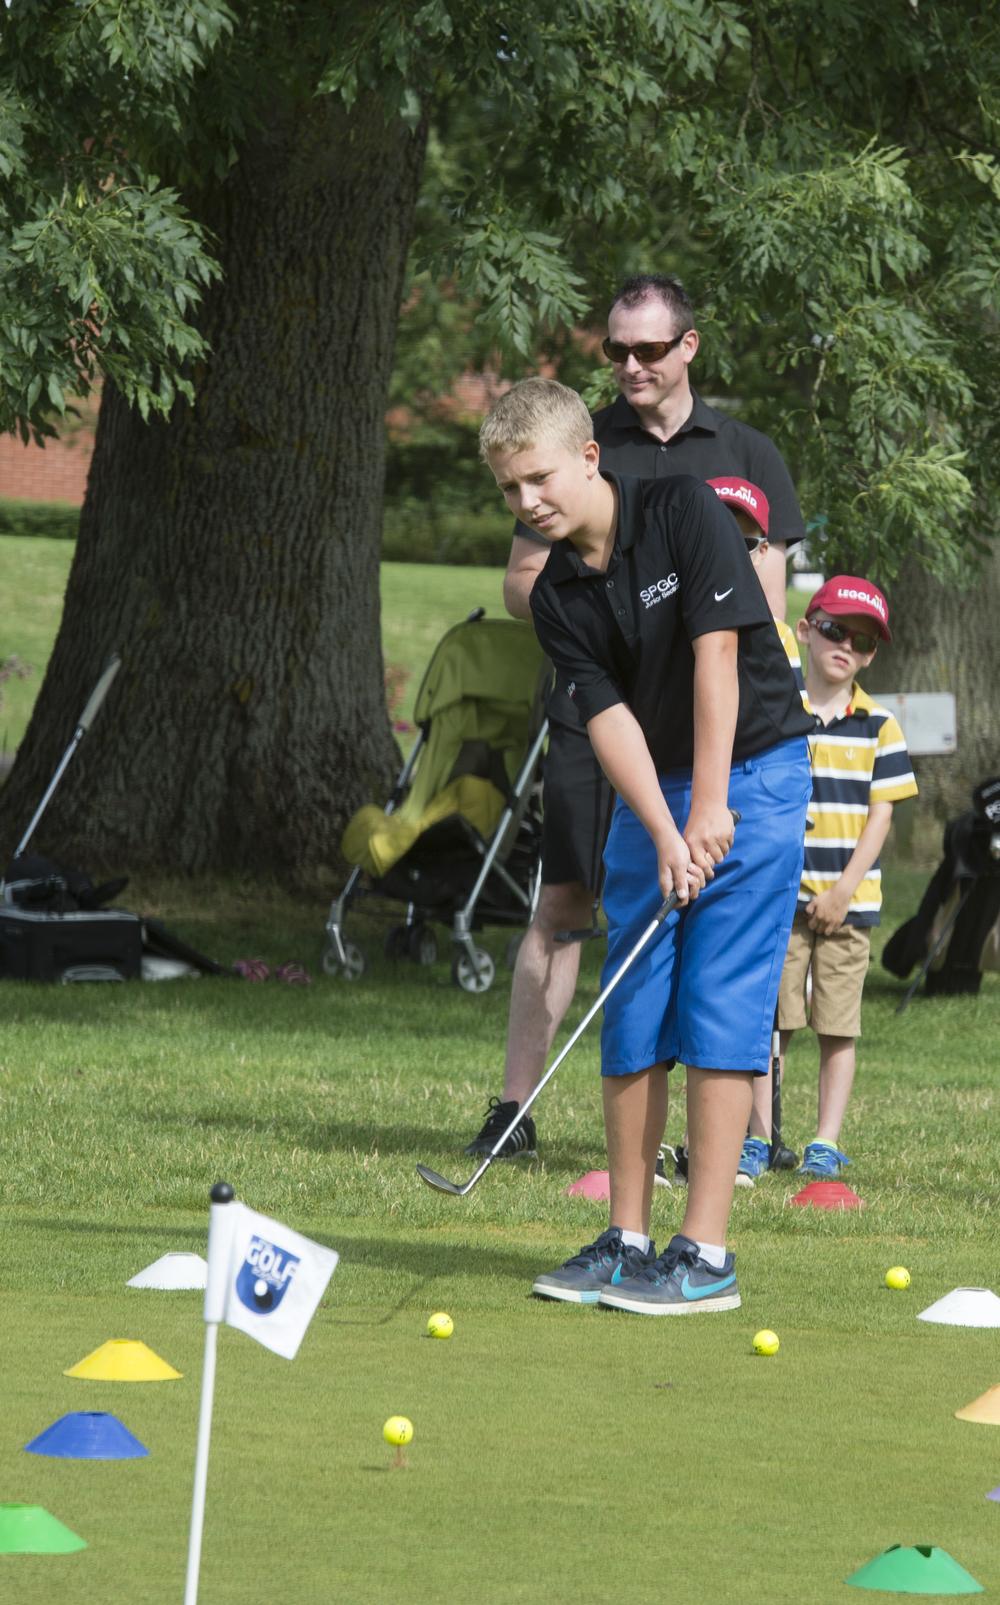 LB_Golf_Roots_family_2016_0339.jpg